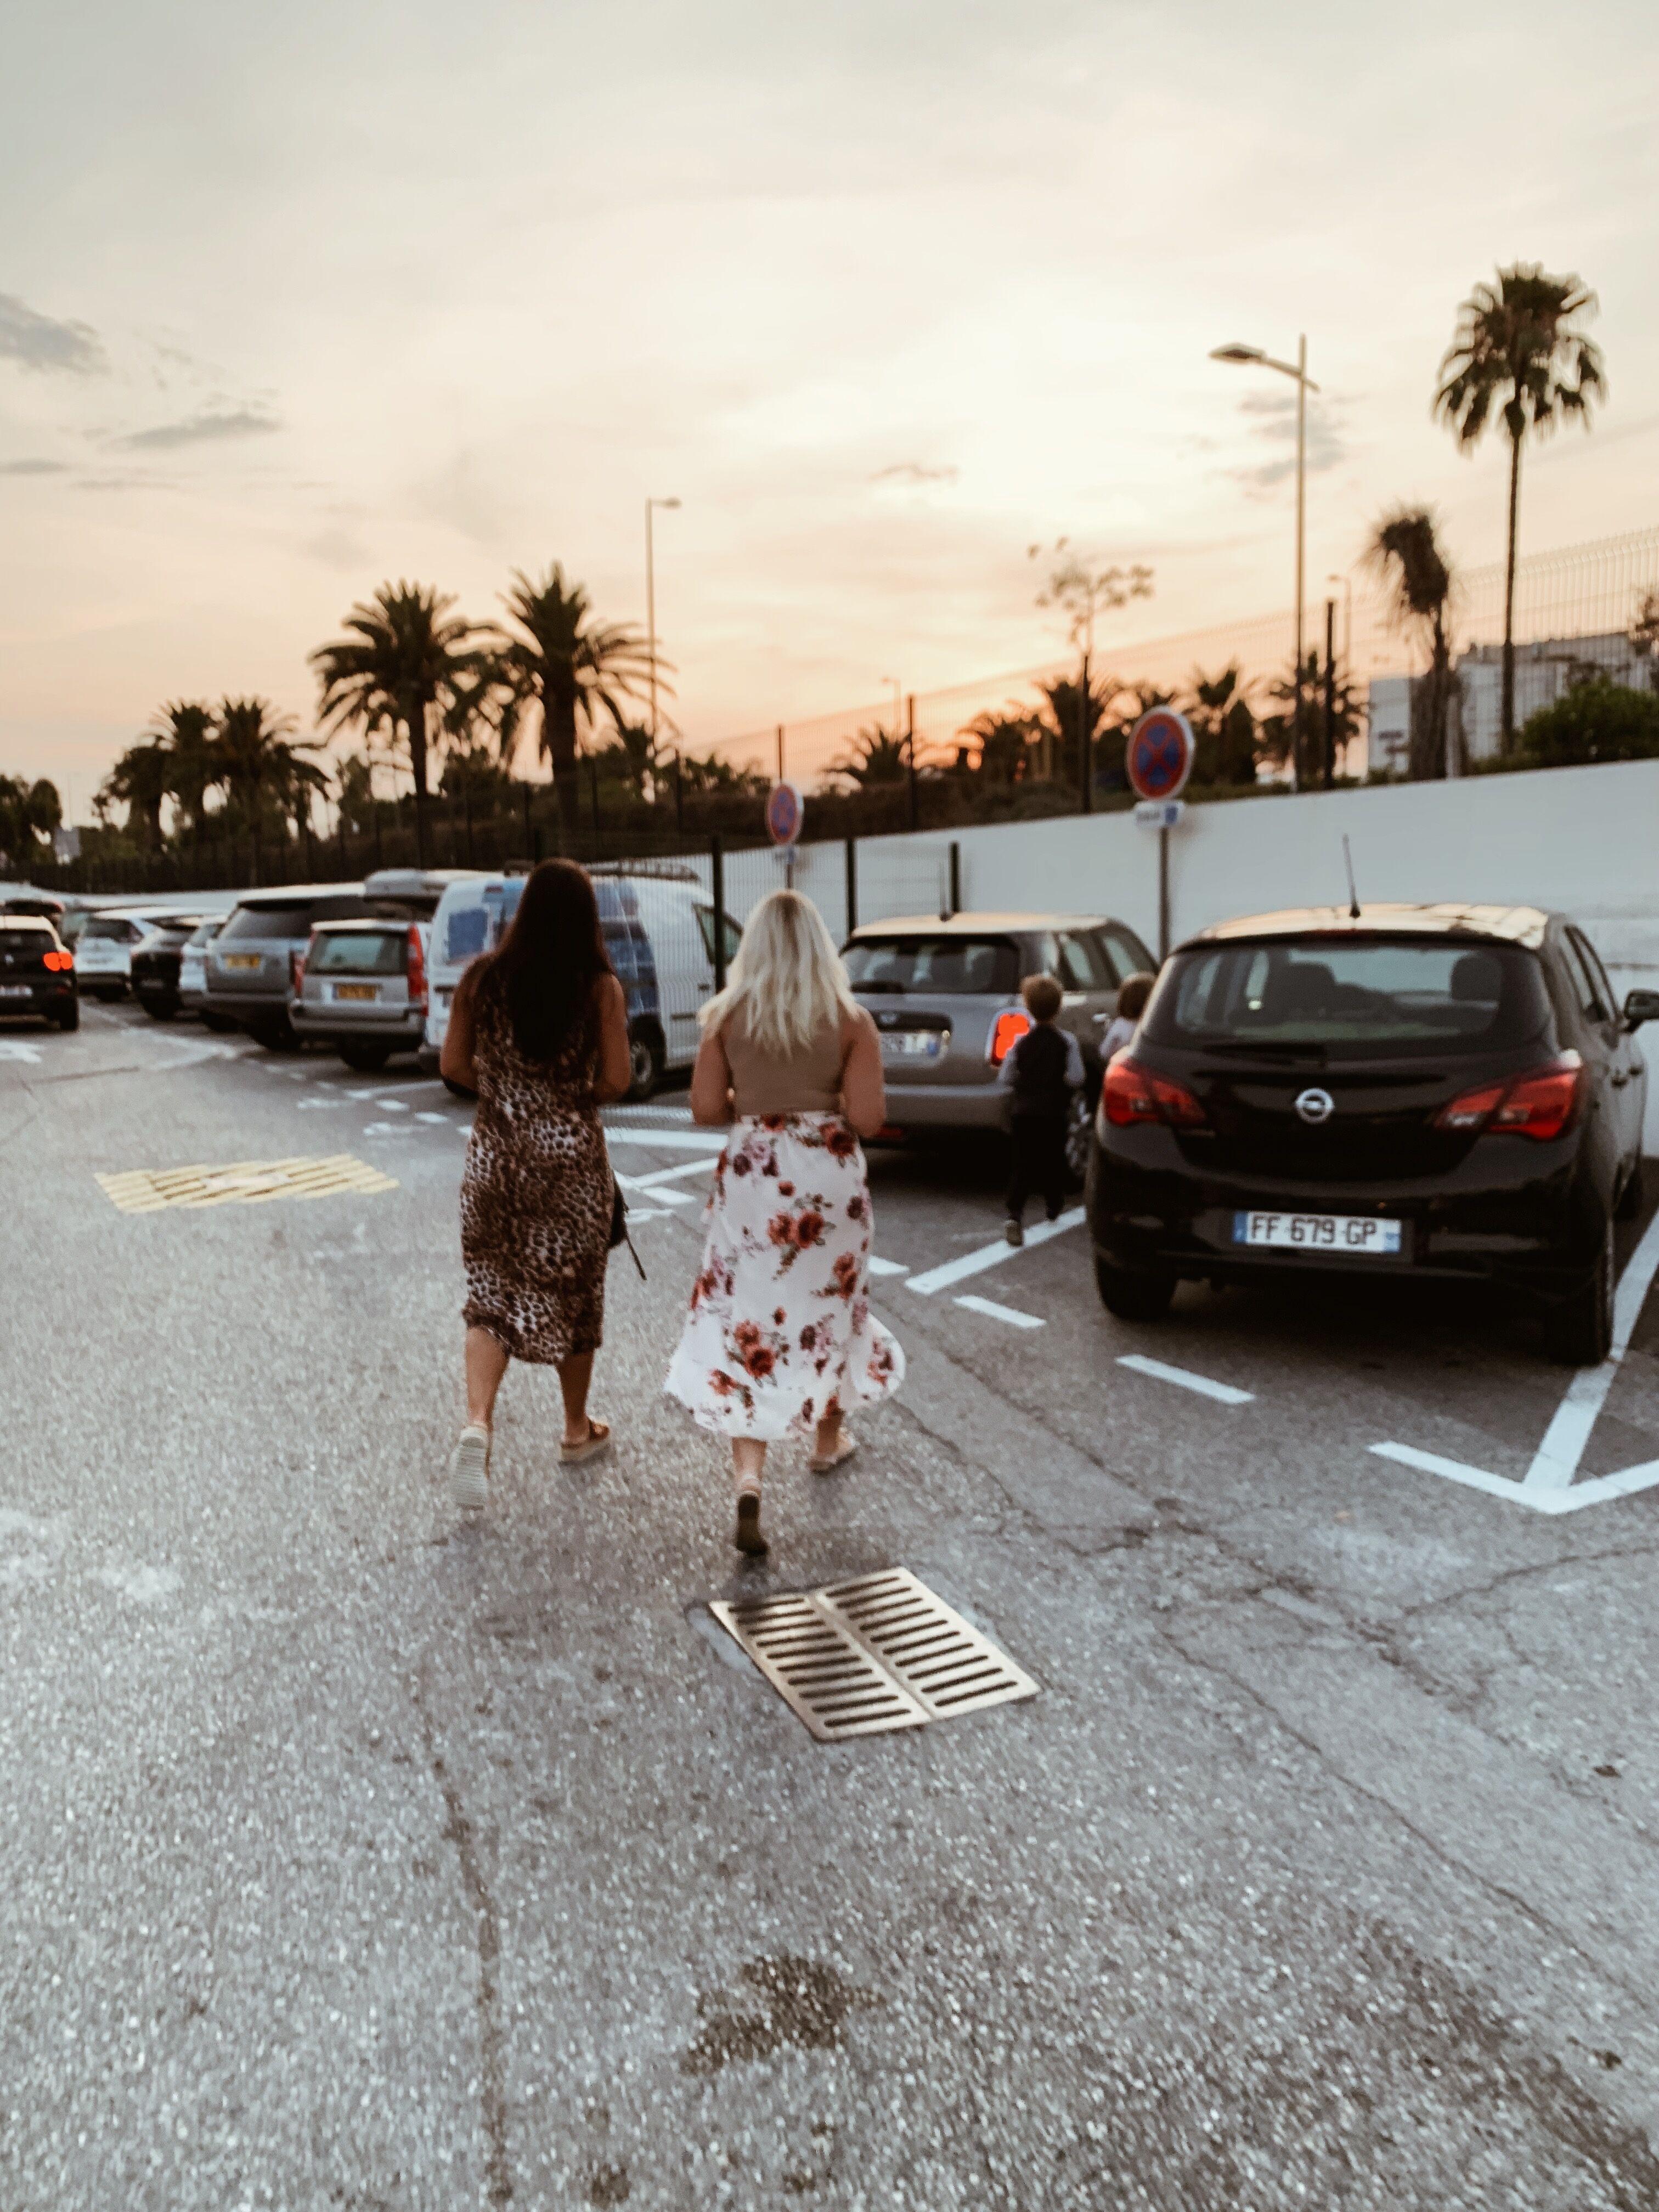 Krnika: Monstret vcks till liv s fort orter placeras fel